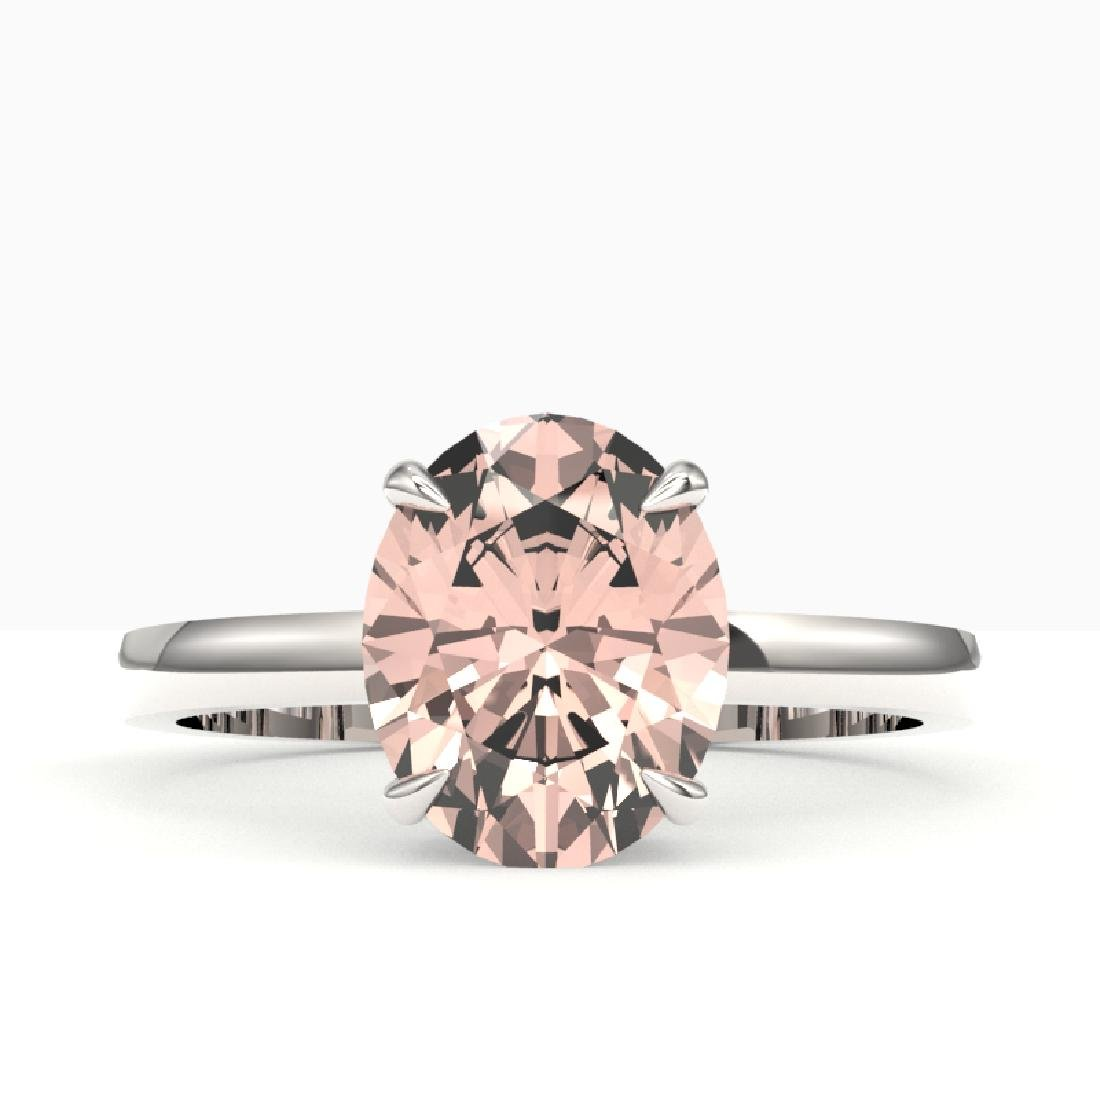 2.75 CTW Morganite Designer Inspired Solitaire Ring 18K